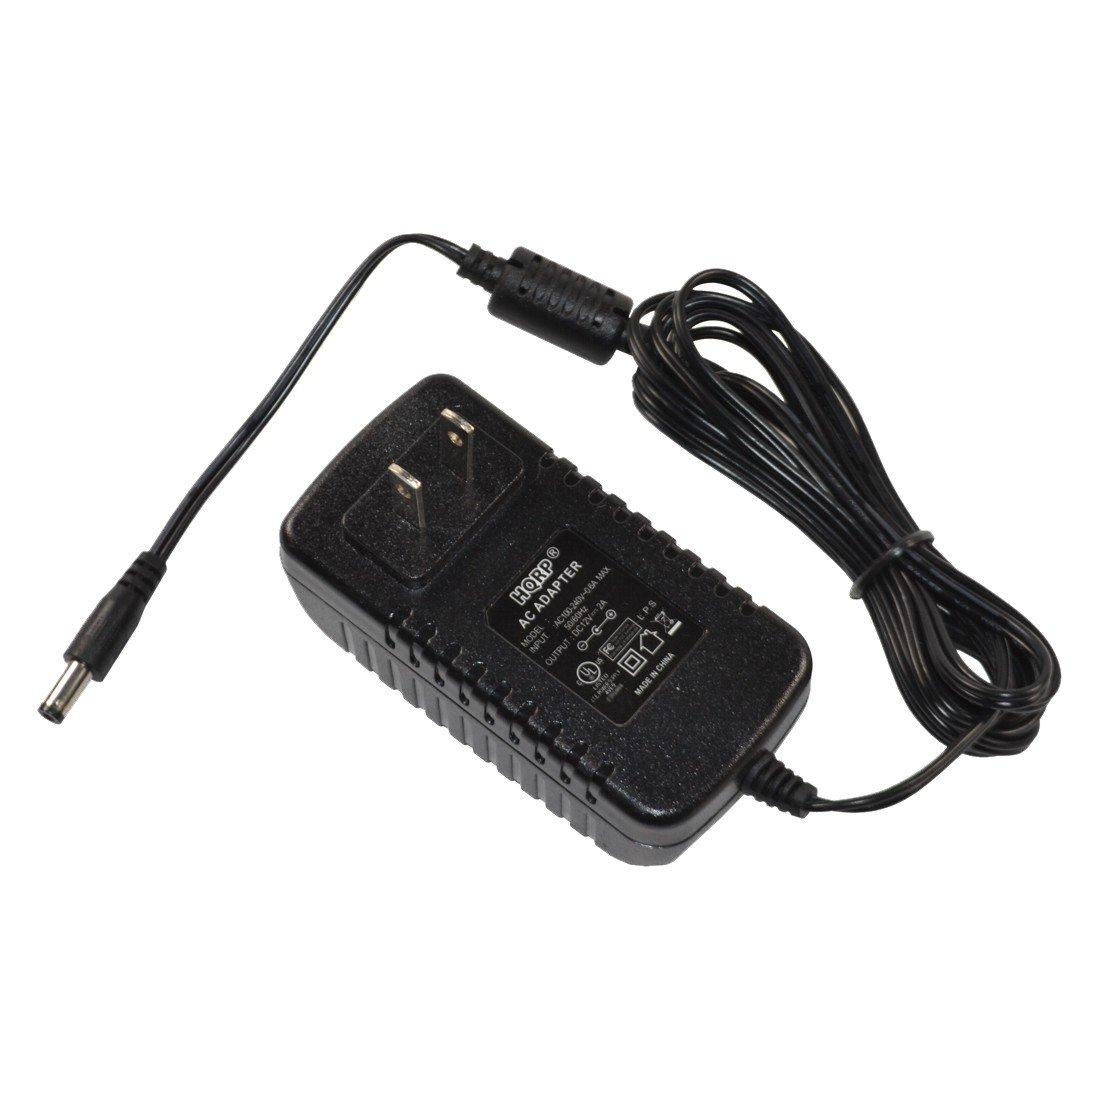 plus HQRP Euro Plug Adapter PSR38 Keyboard Replacement Power Supply Cord PSR-38 PSR270 UL Listed HQRP AC Adapter for Yamaha PSR-270